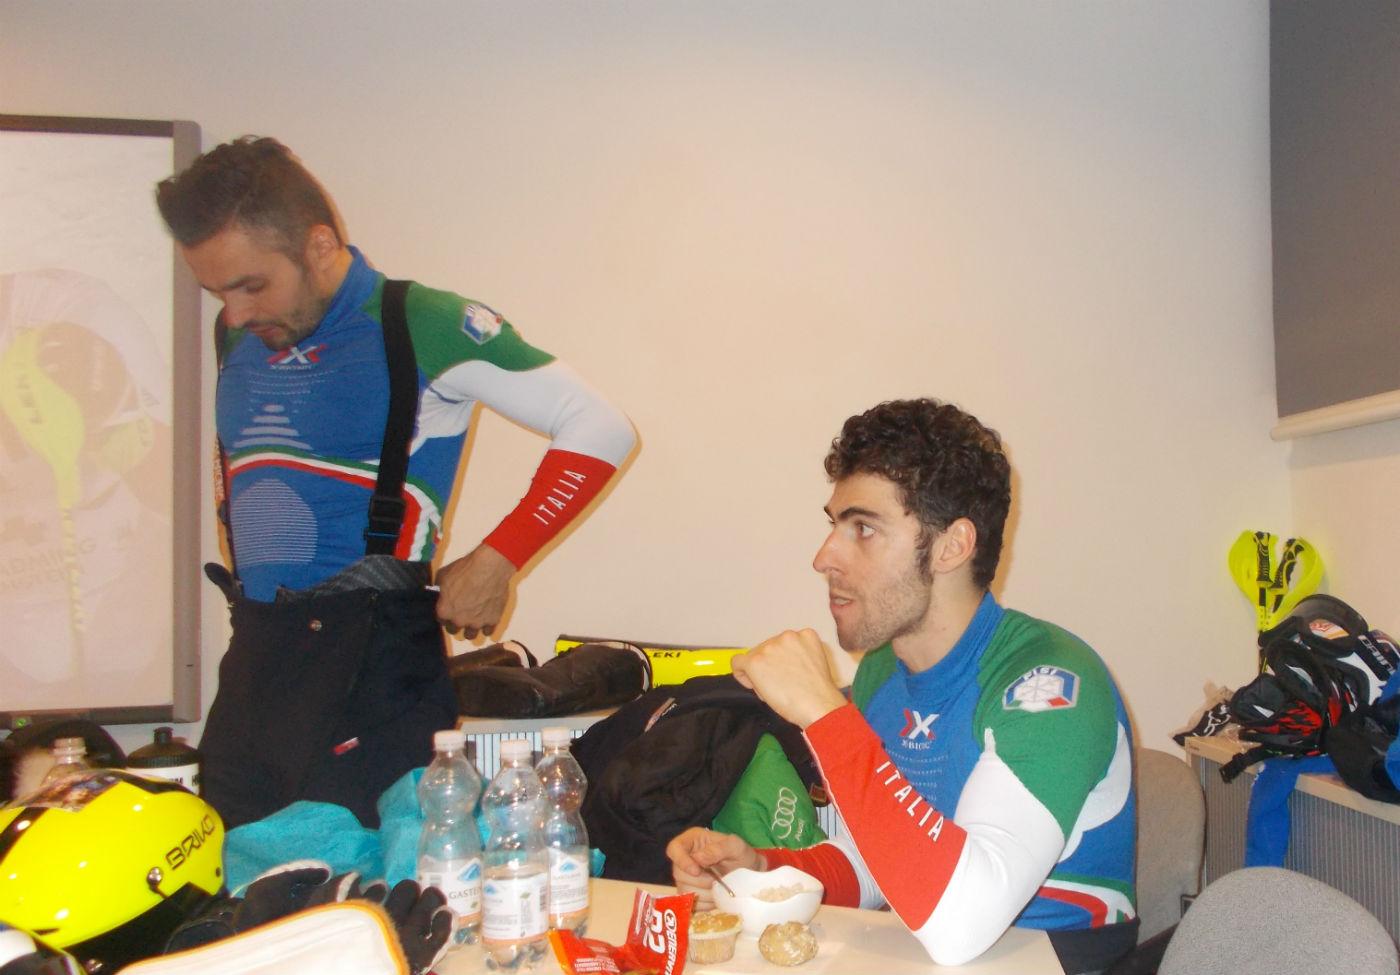 Patrick Thaler e Stefano Gross nel team hospitality ©Gabriele Pezzaglia